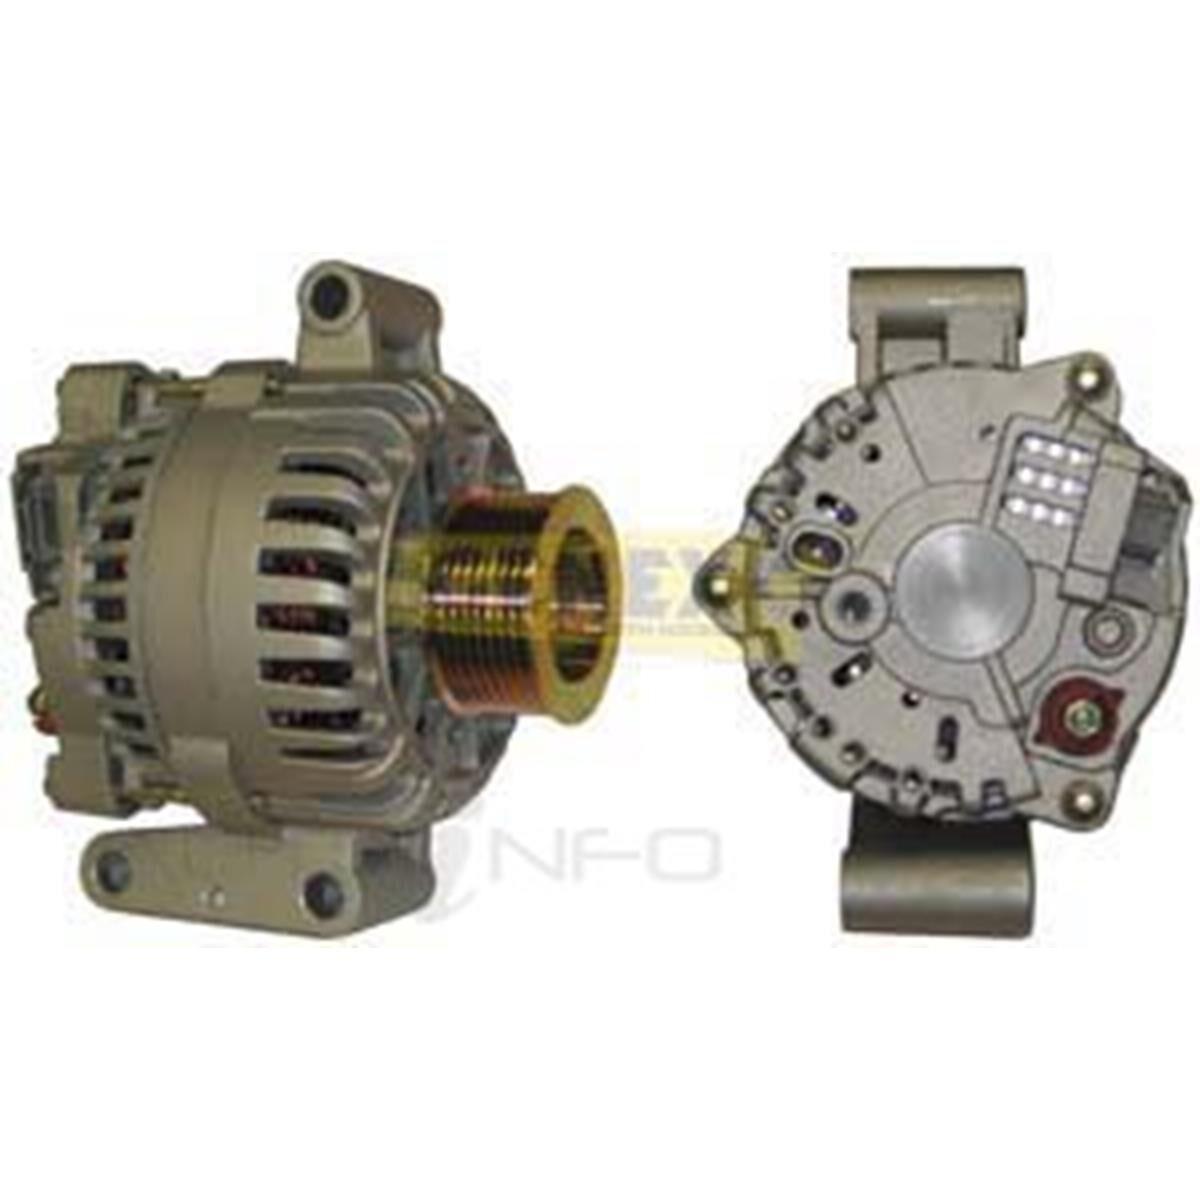 medium resolution of 99 camry fuse box diagram 25 wiring diagram images 87 4runner 89 4runner interior 2011 toyota